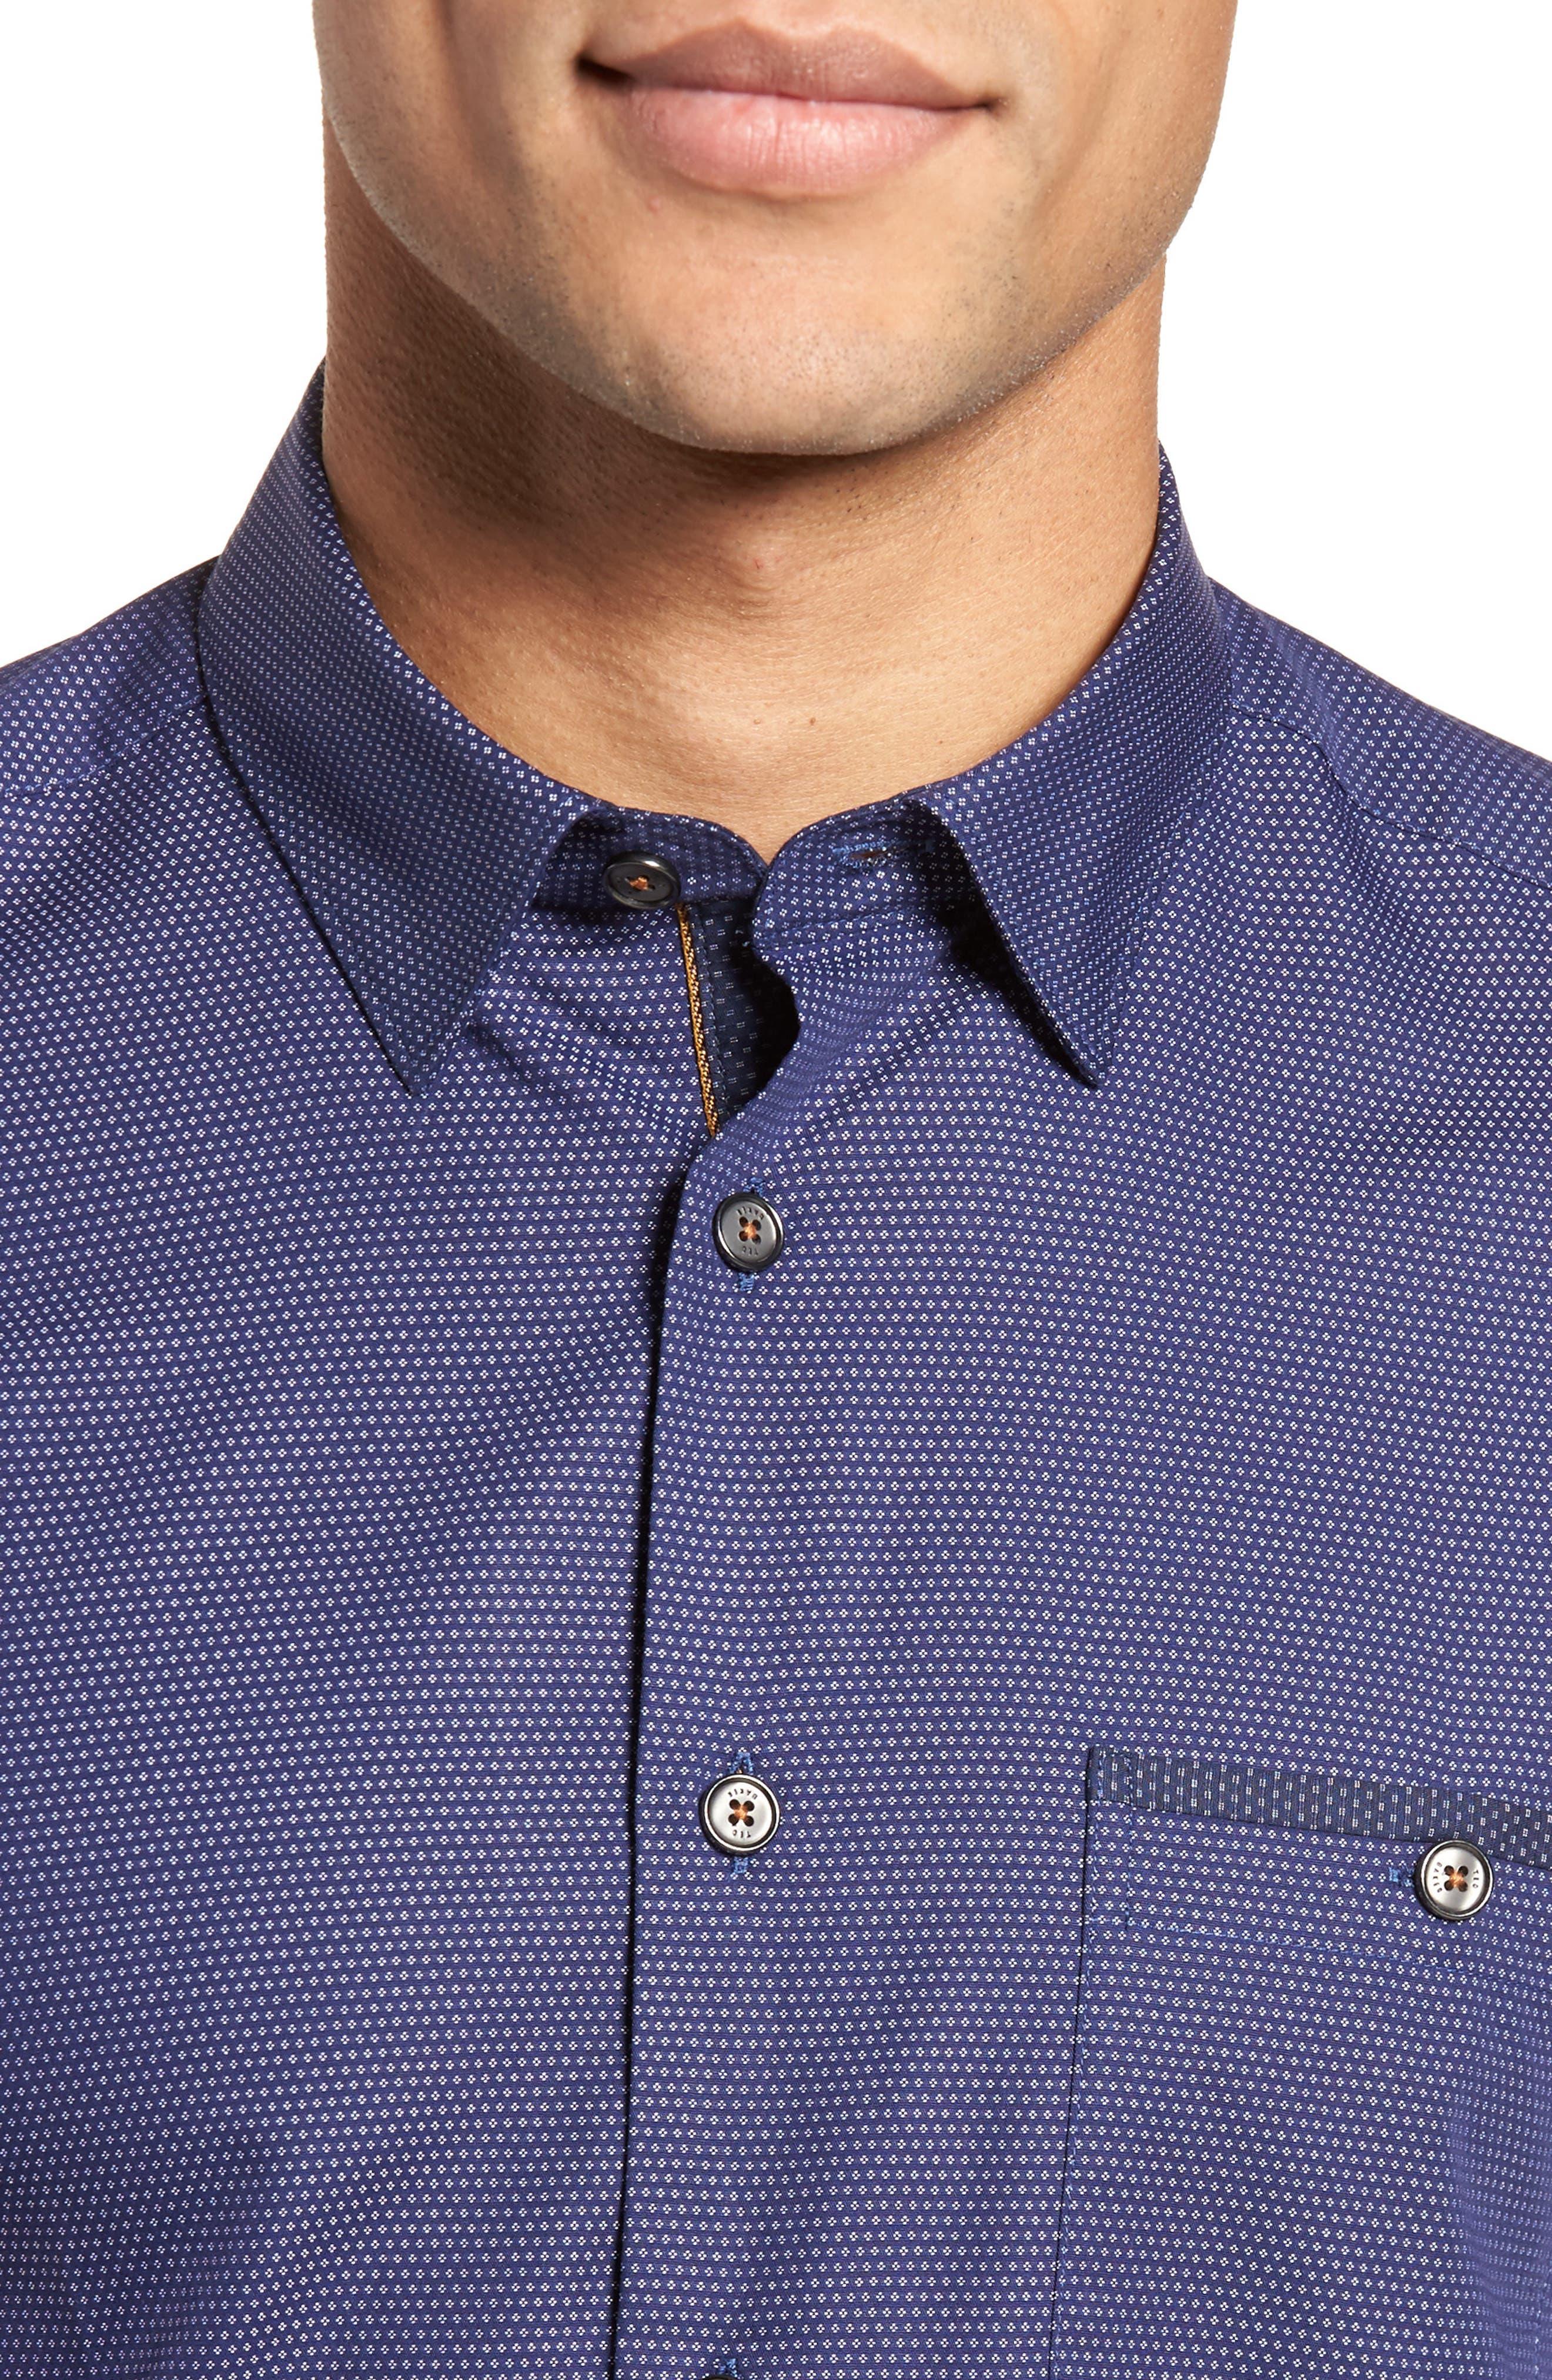 Dotdots Trim Fit Dot Short Sleeve Sport Shirt,                             Alternate thumbnail 2, color,                             Navy